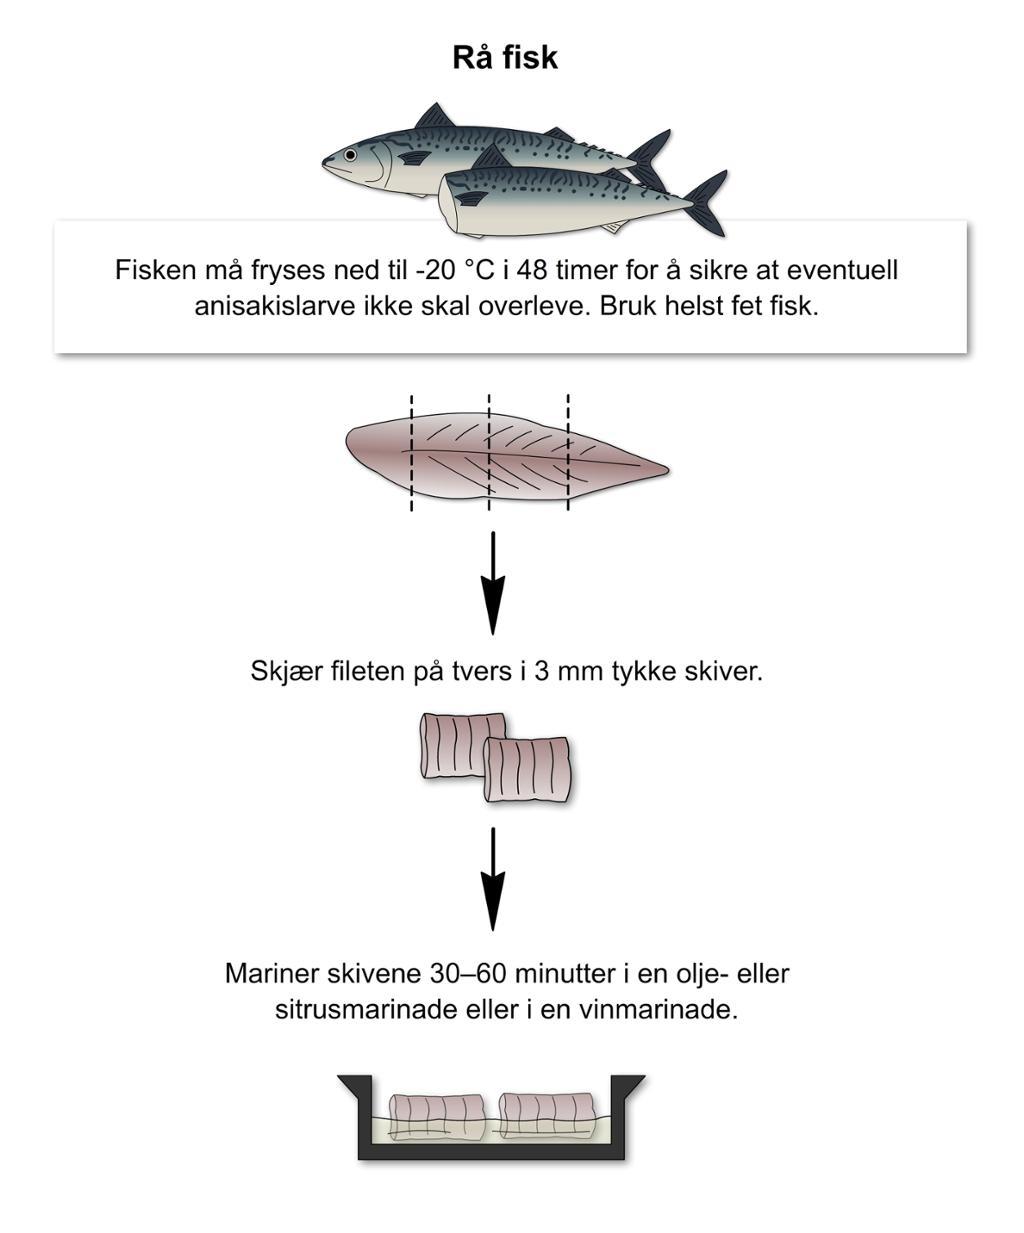 Rå fisk